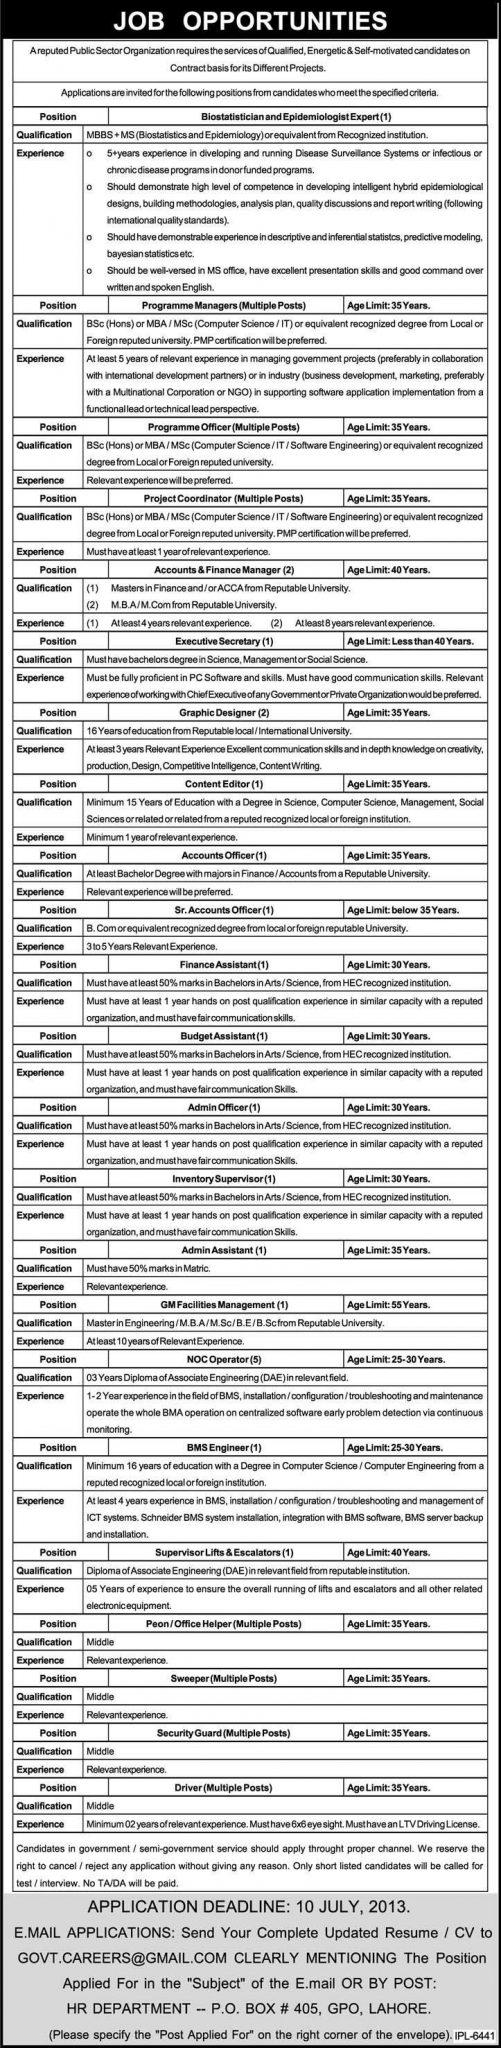 Public Sector Organization Jobs for Bio Statistics, Programme Manager & Graphic Designer